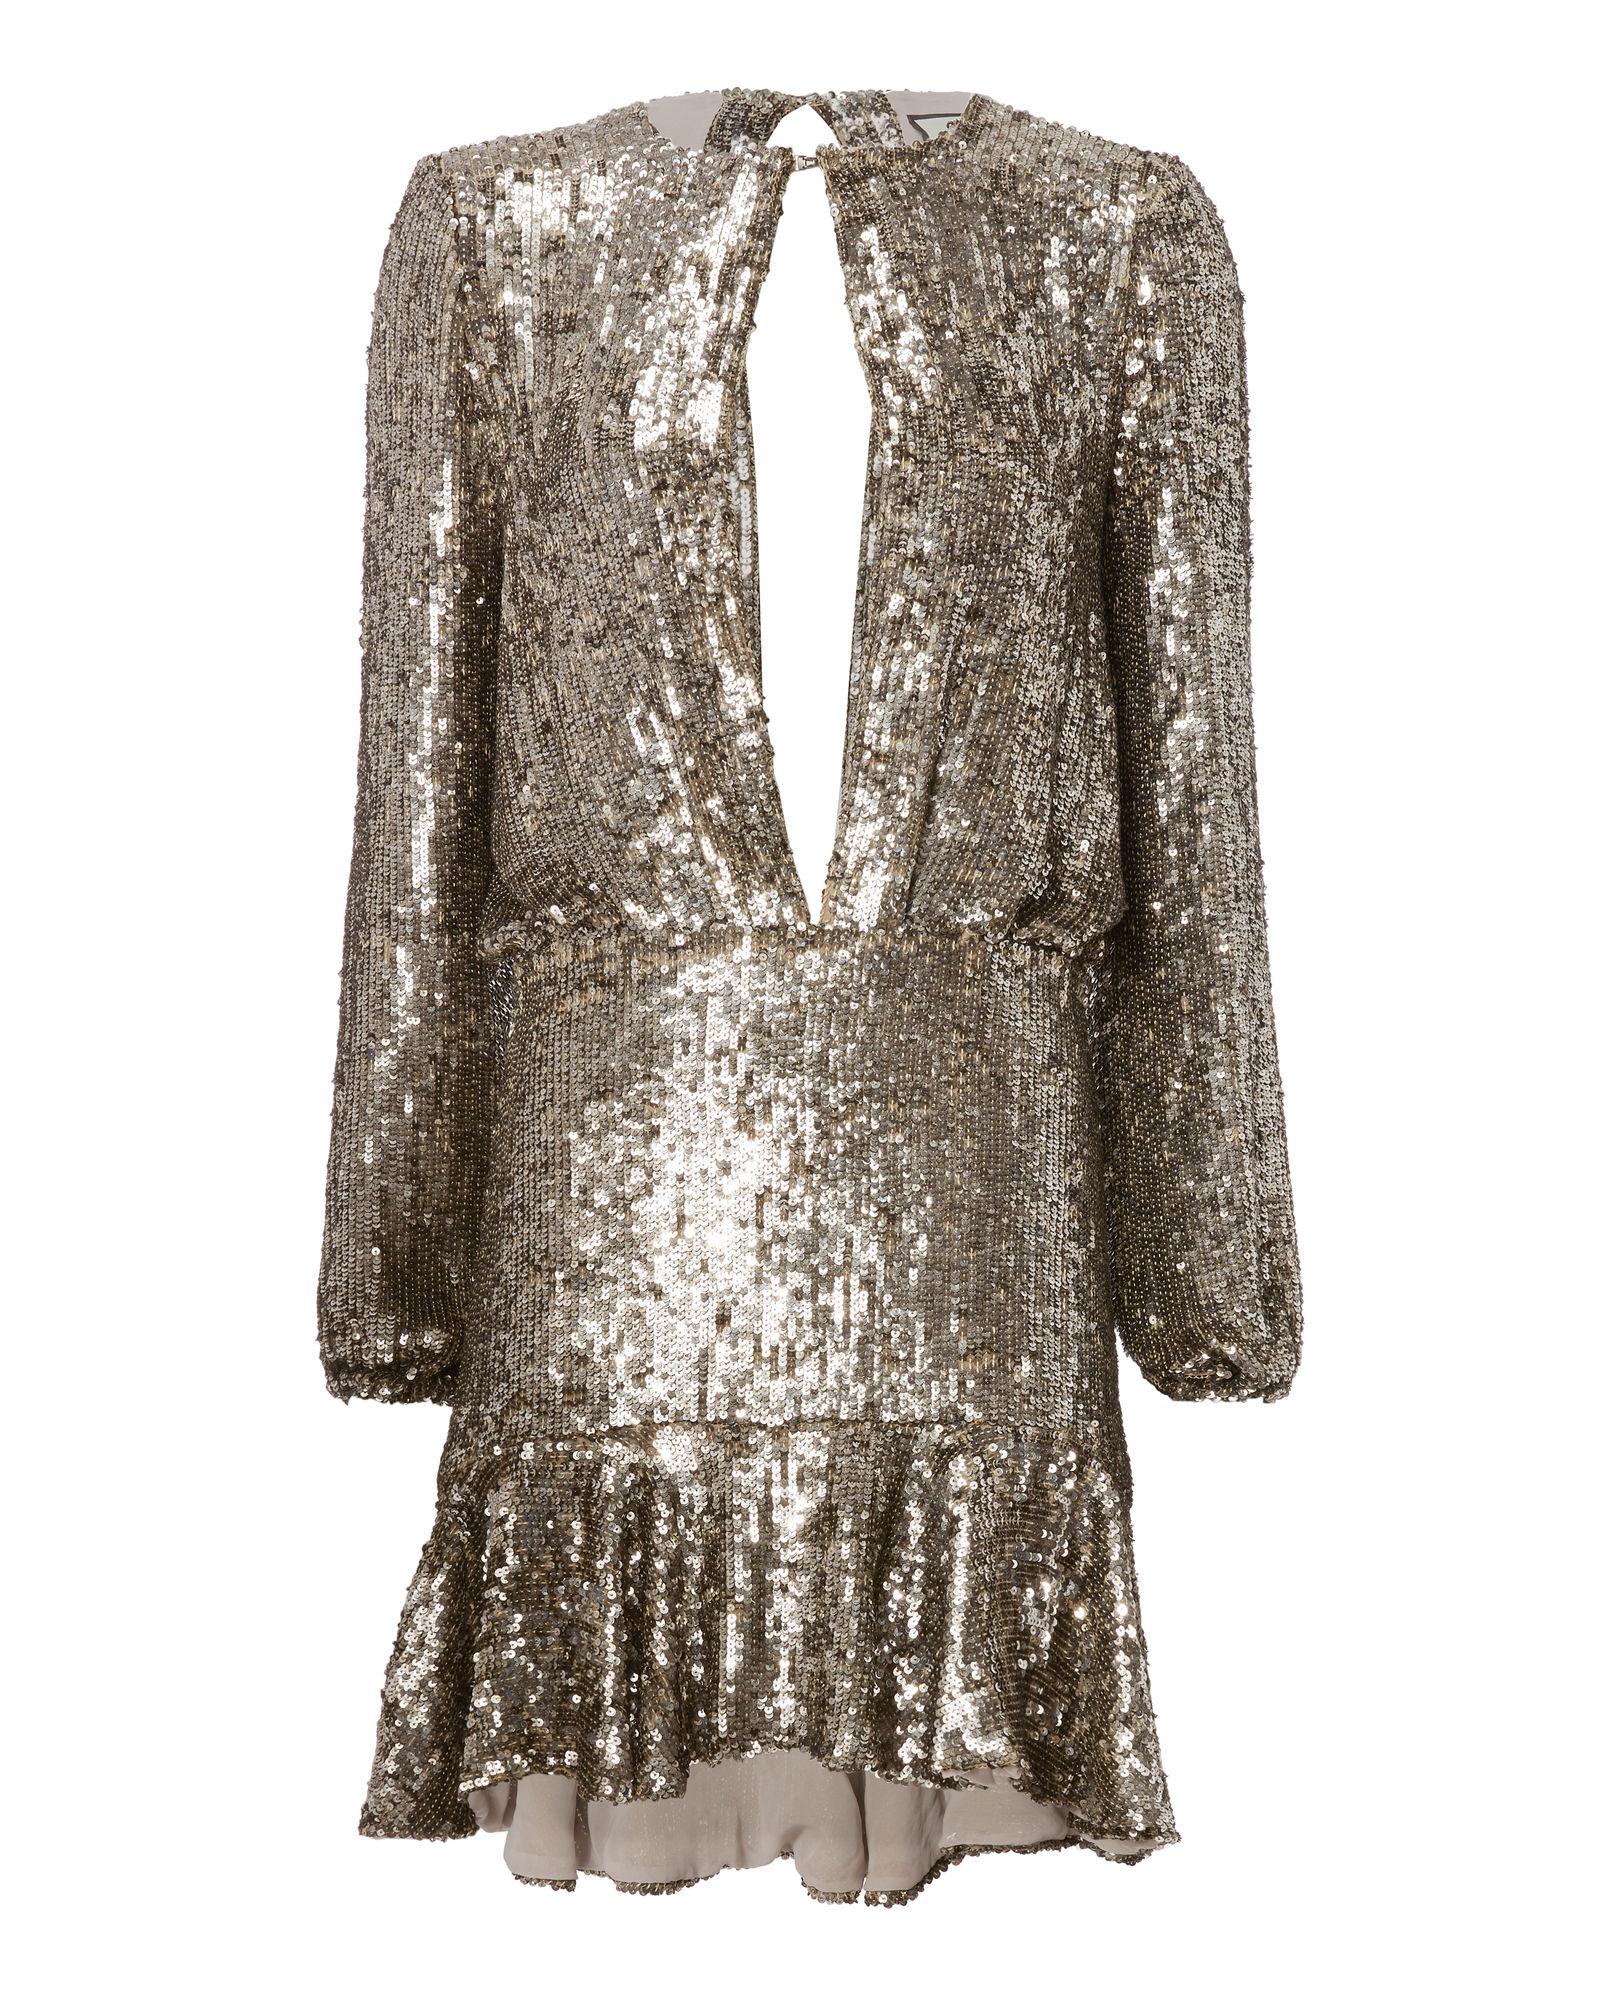 Alexis Tamera Silver Sequin Keyhole Mini Dress Fashion